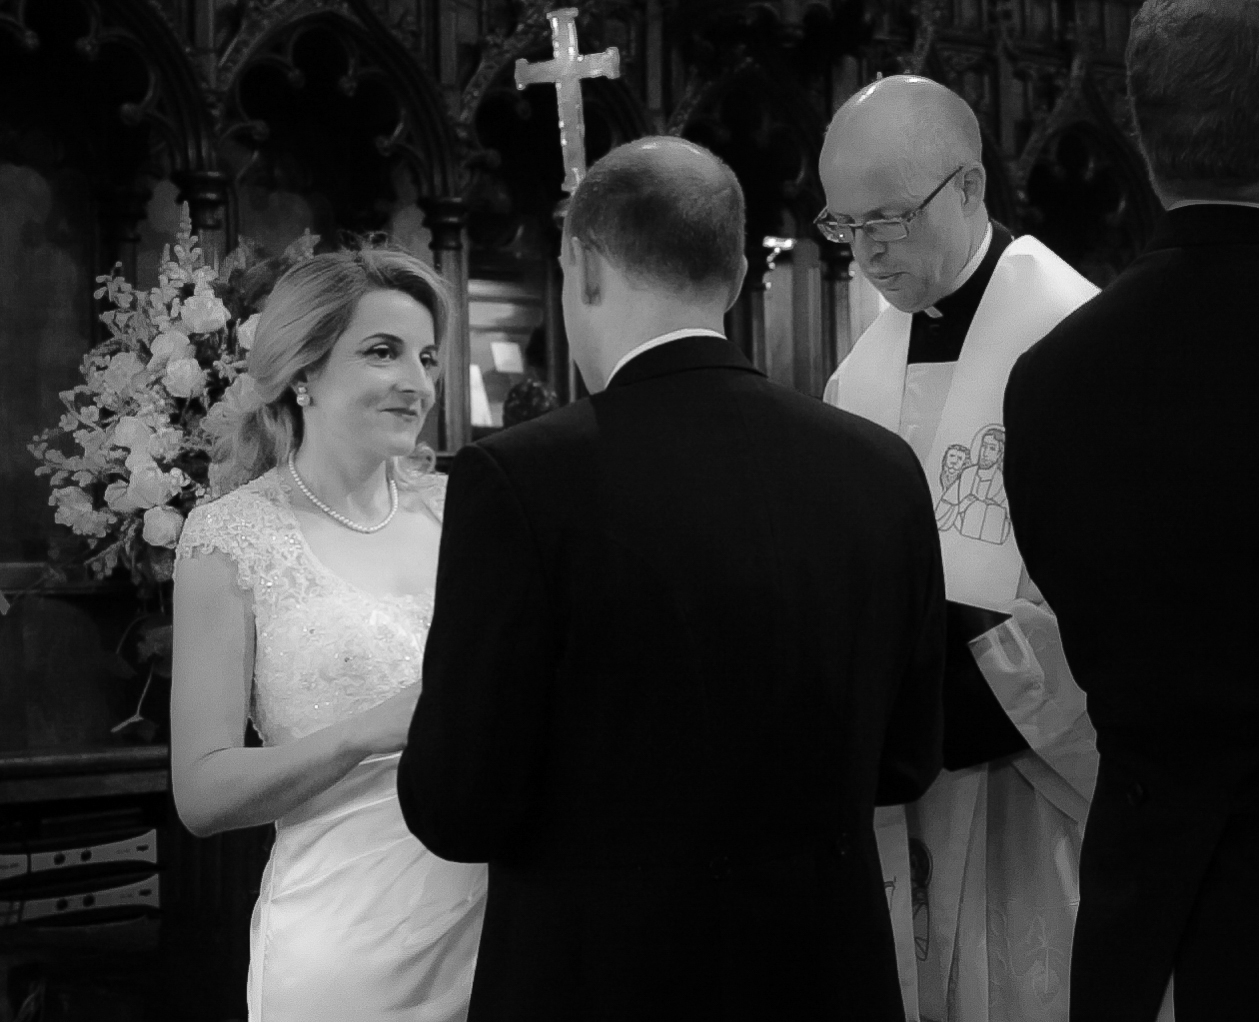 ealing-richmond-church-wedding-videography-london-uk-destination-wedding-photography-Adam-Rowley